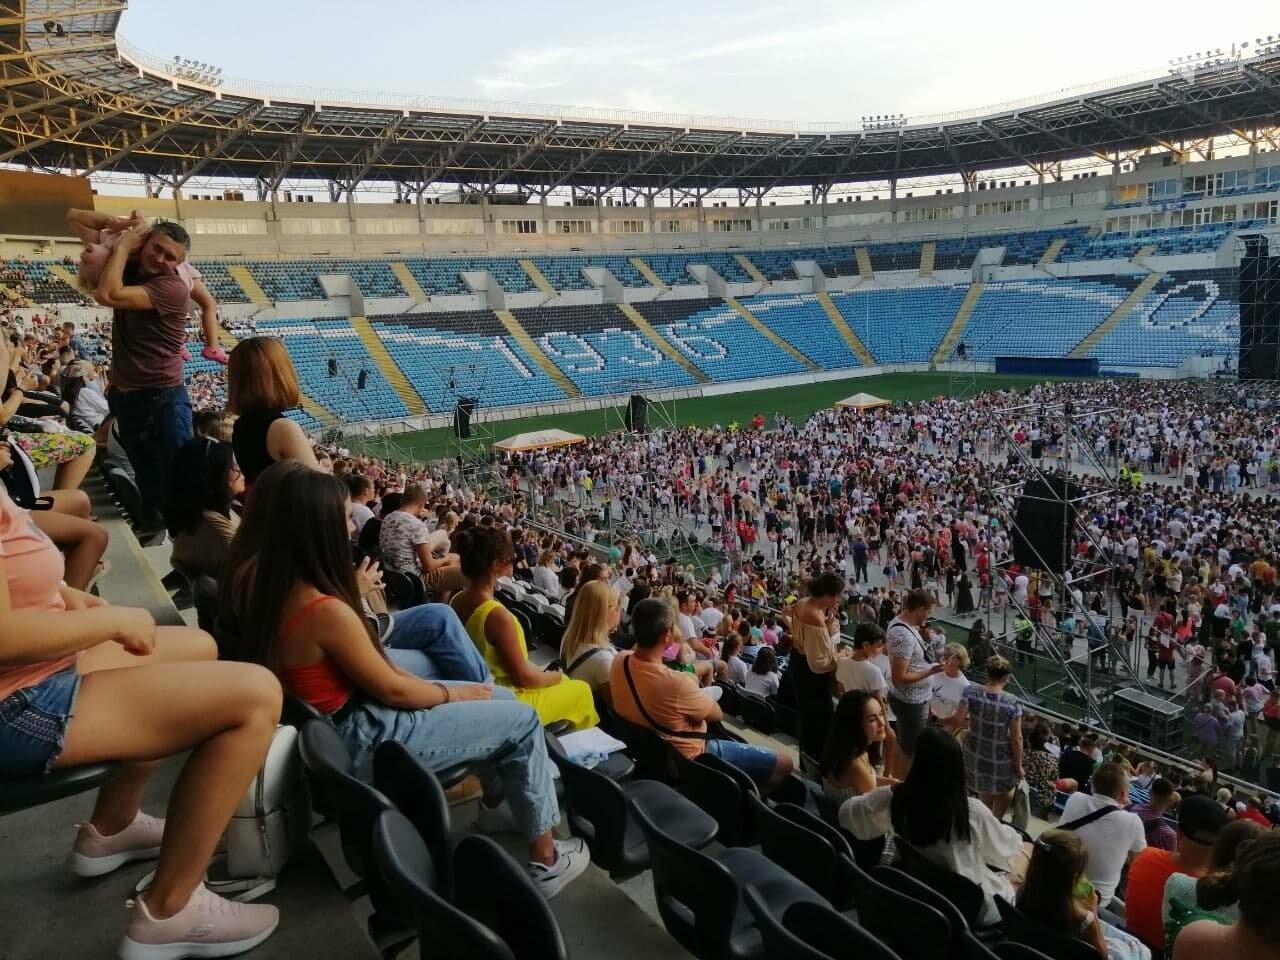 Монатик на стадионе спел все песни об Одессе, - ФОТО, ВИДЕО, фото-6